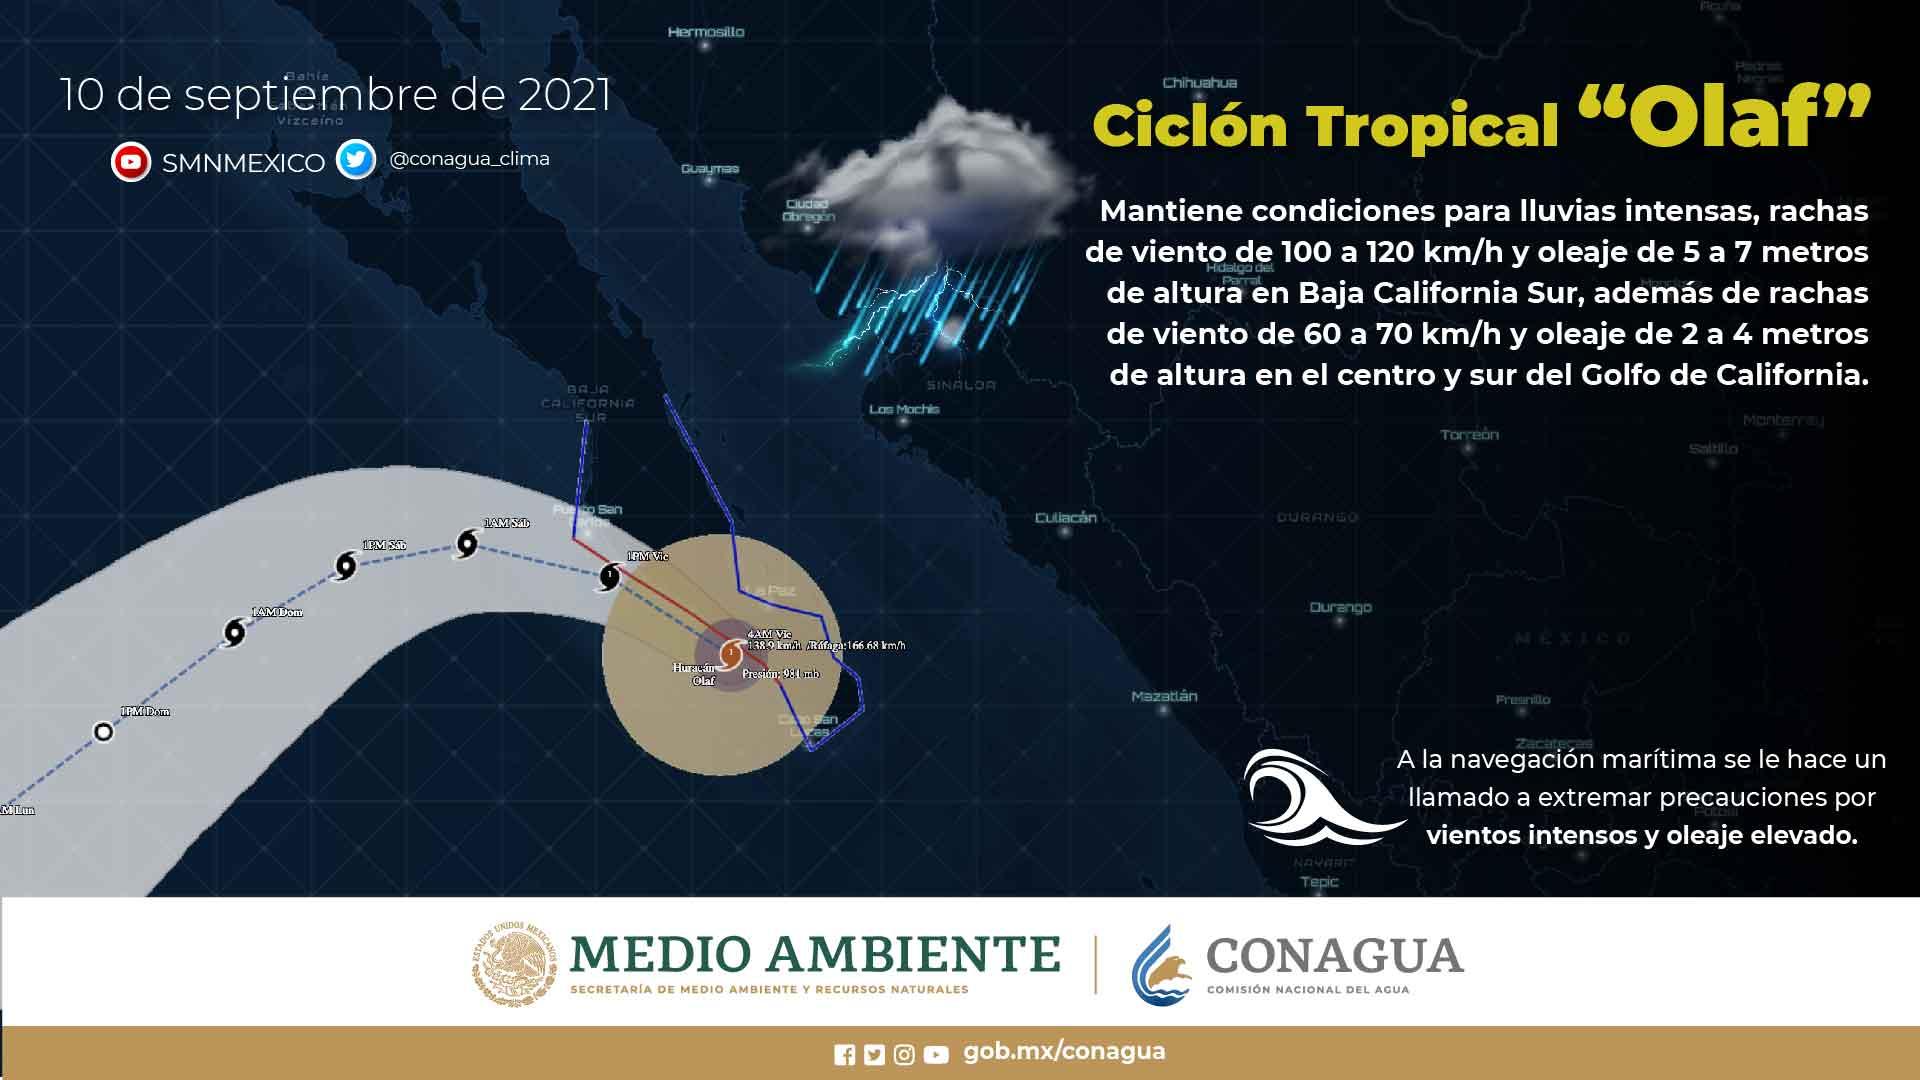 Olaf se encuentra esta mañana sobre la línea de costa en Baja California Sur como tormenta tropical